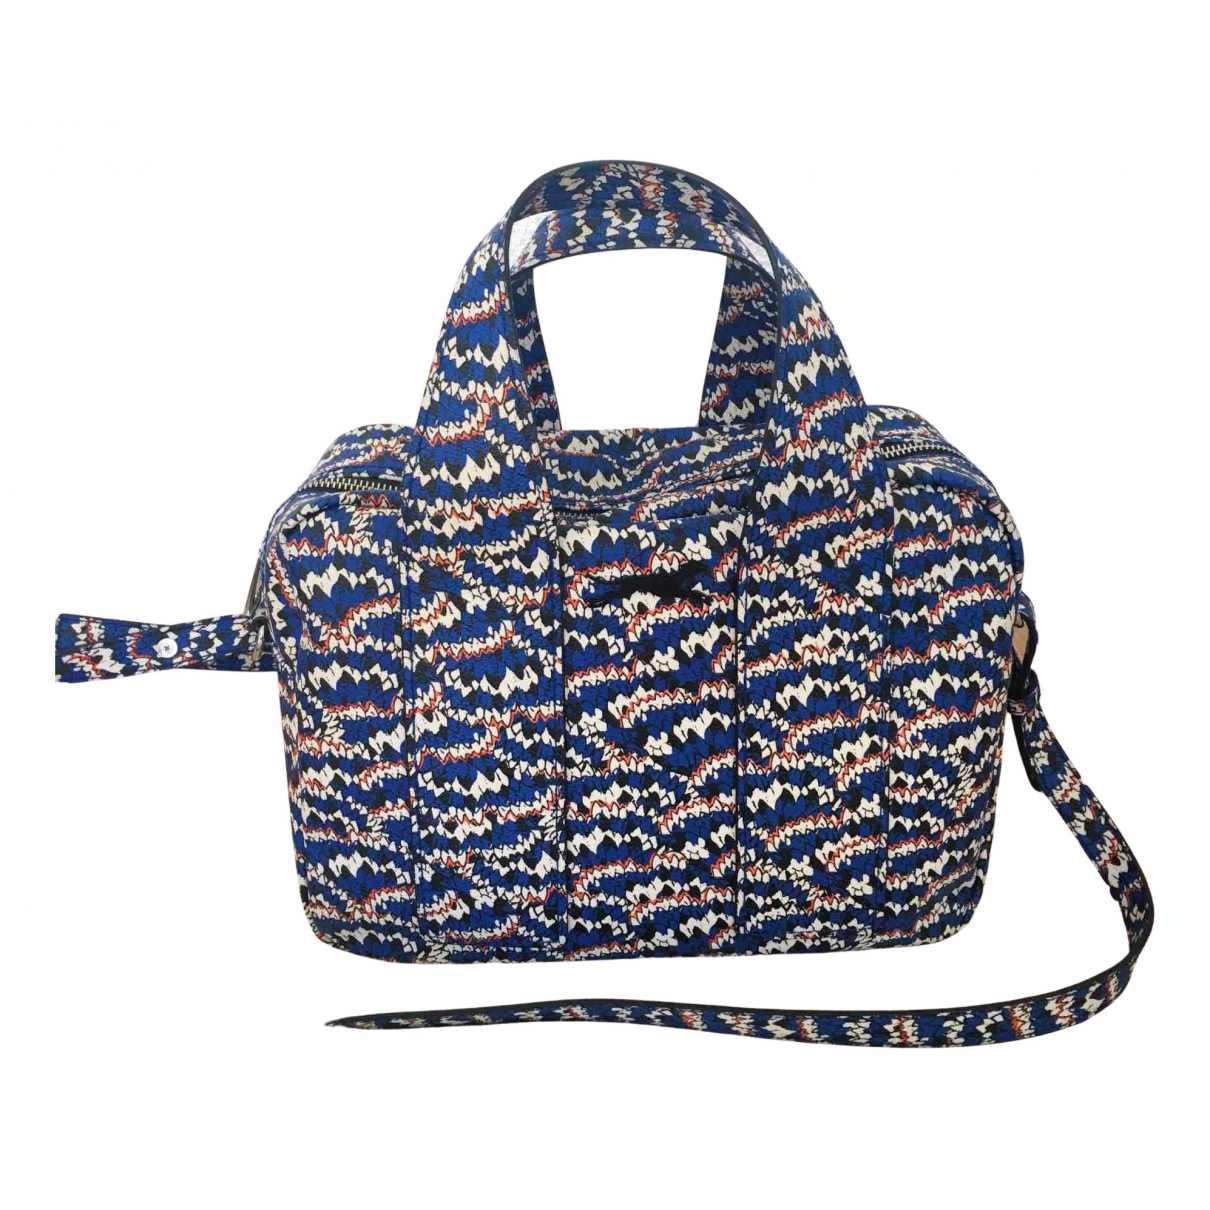 Bimba Y Lola \N Handtasche in  Blau Polyester